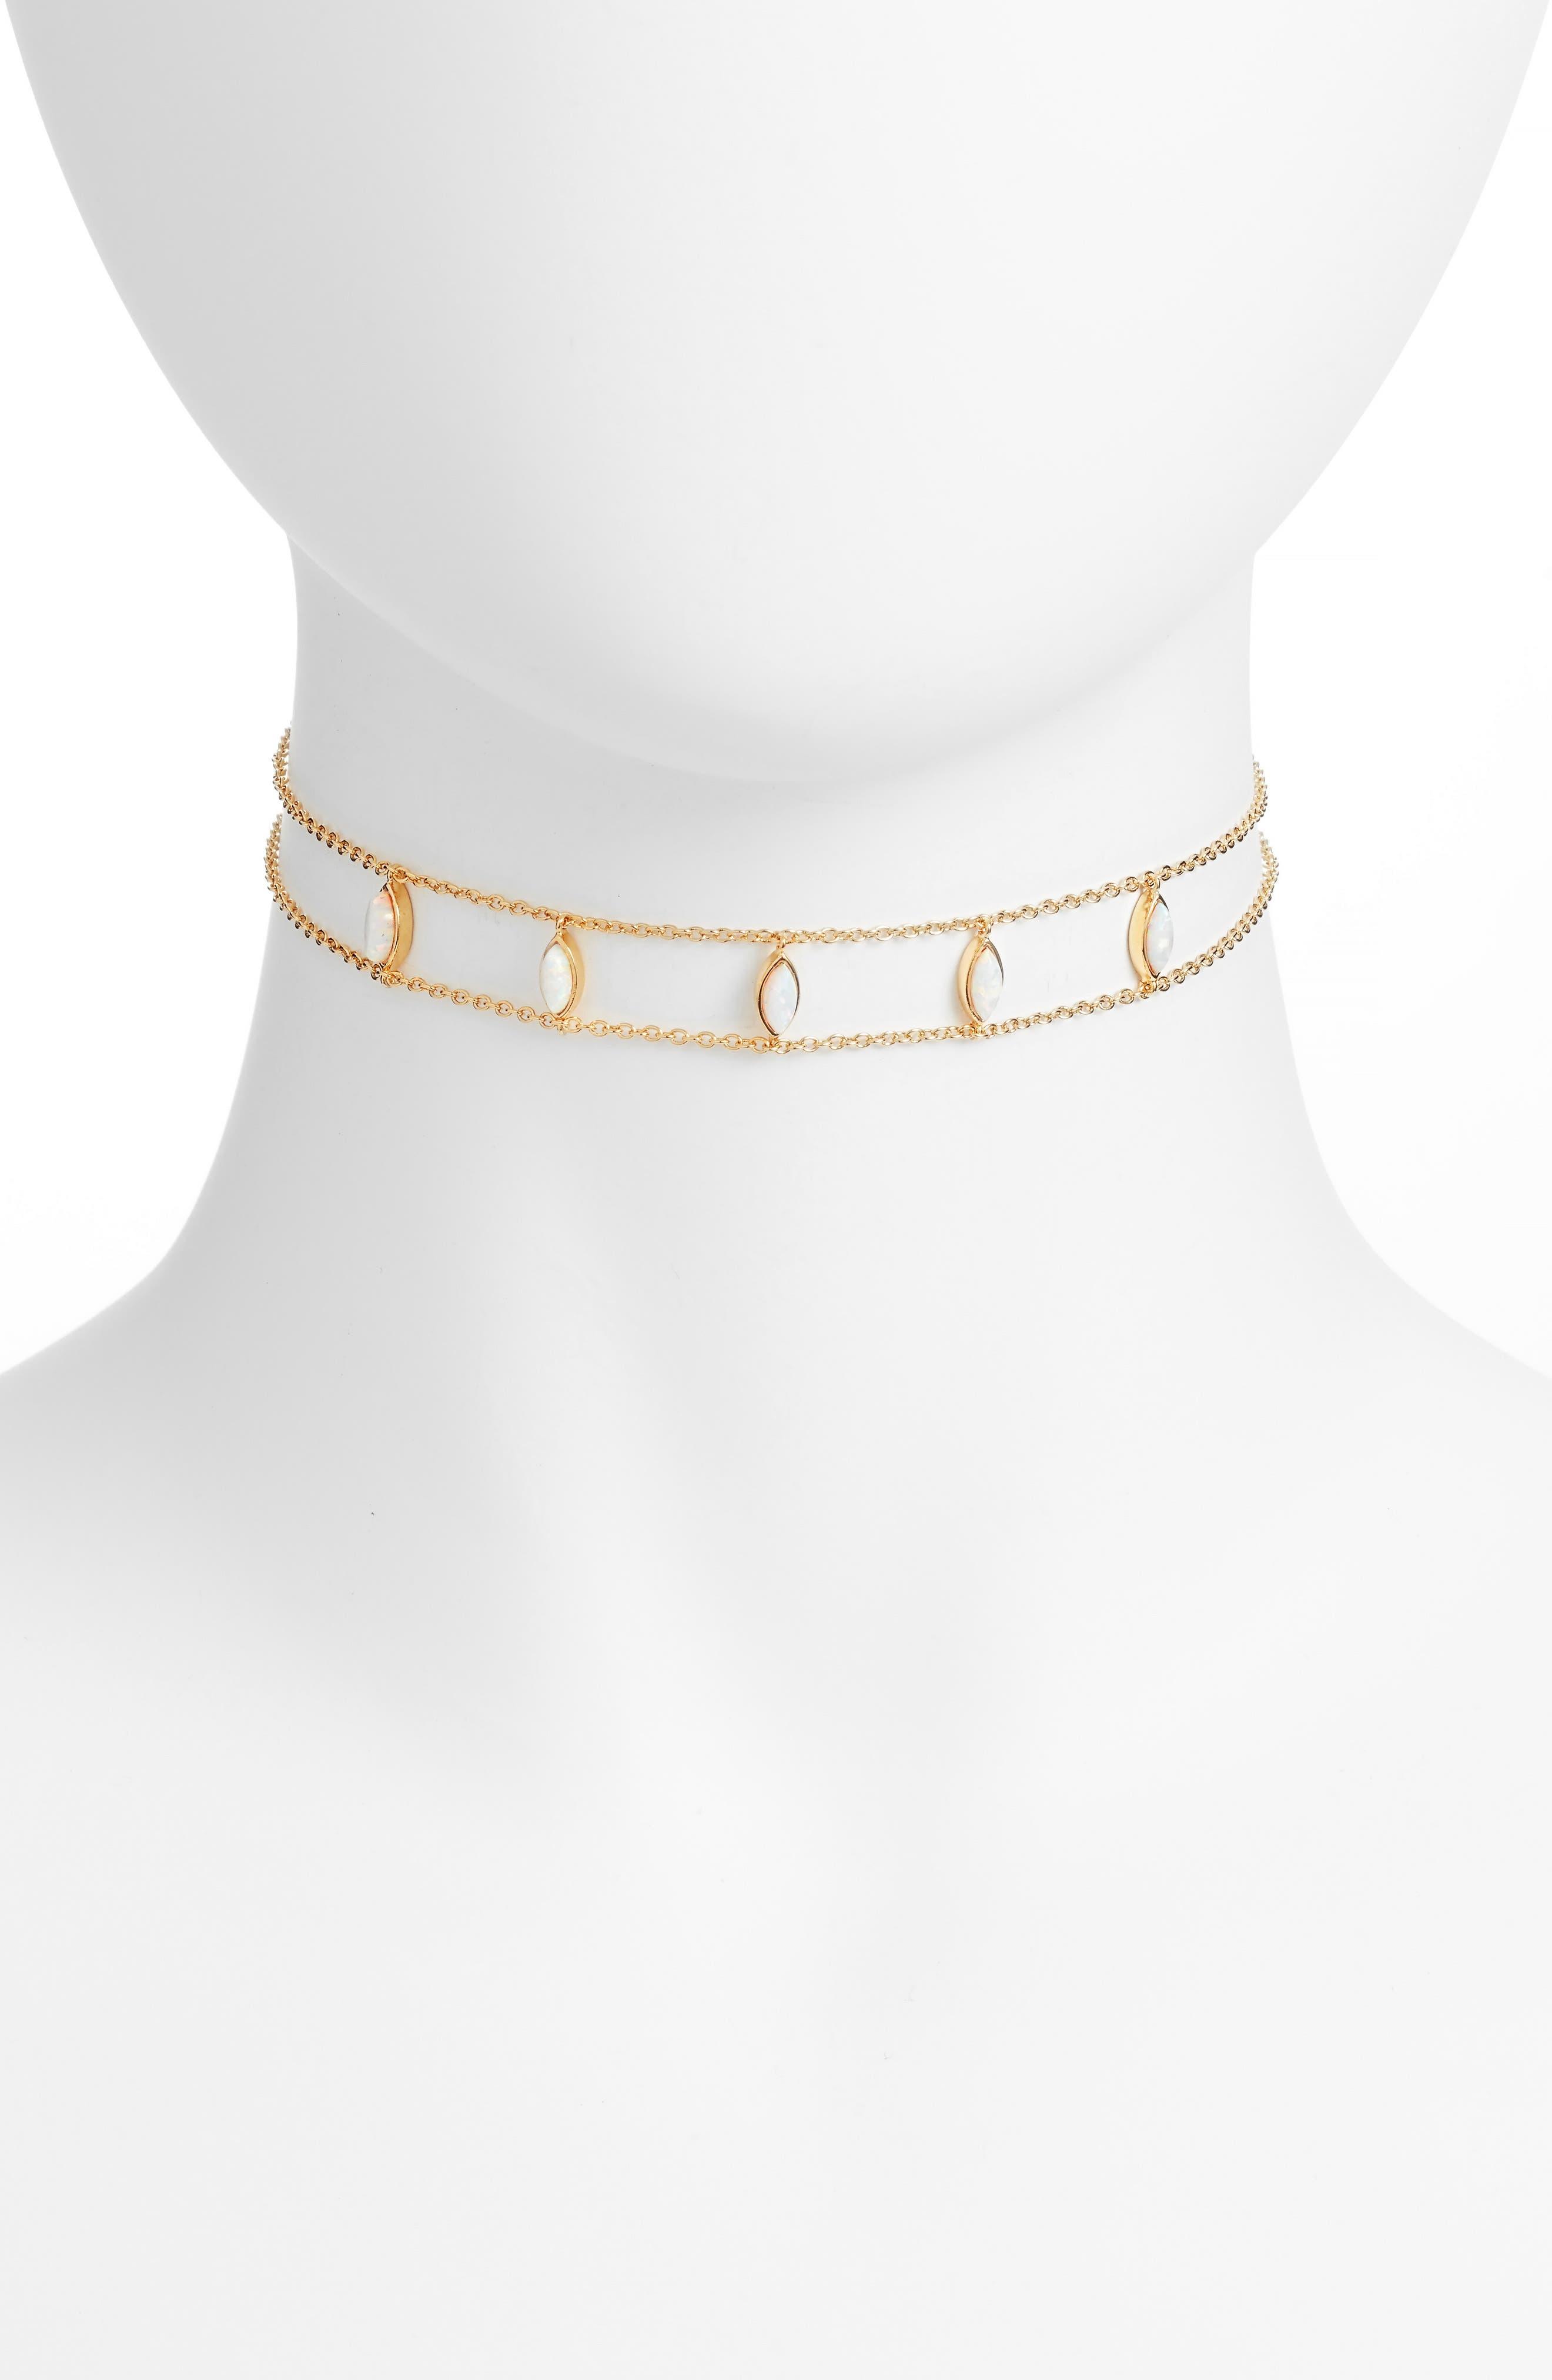 Joie Marquis Choker Necklace,                         Main,                         color, 710